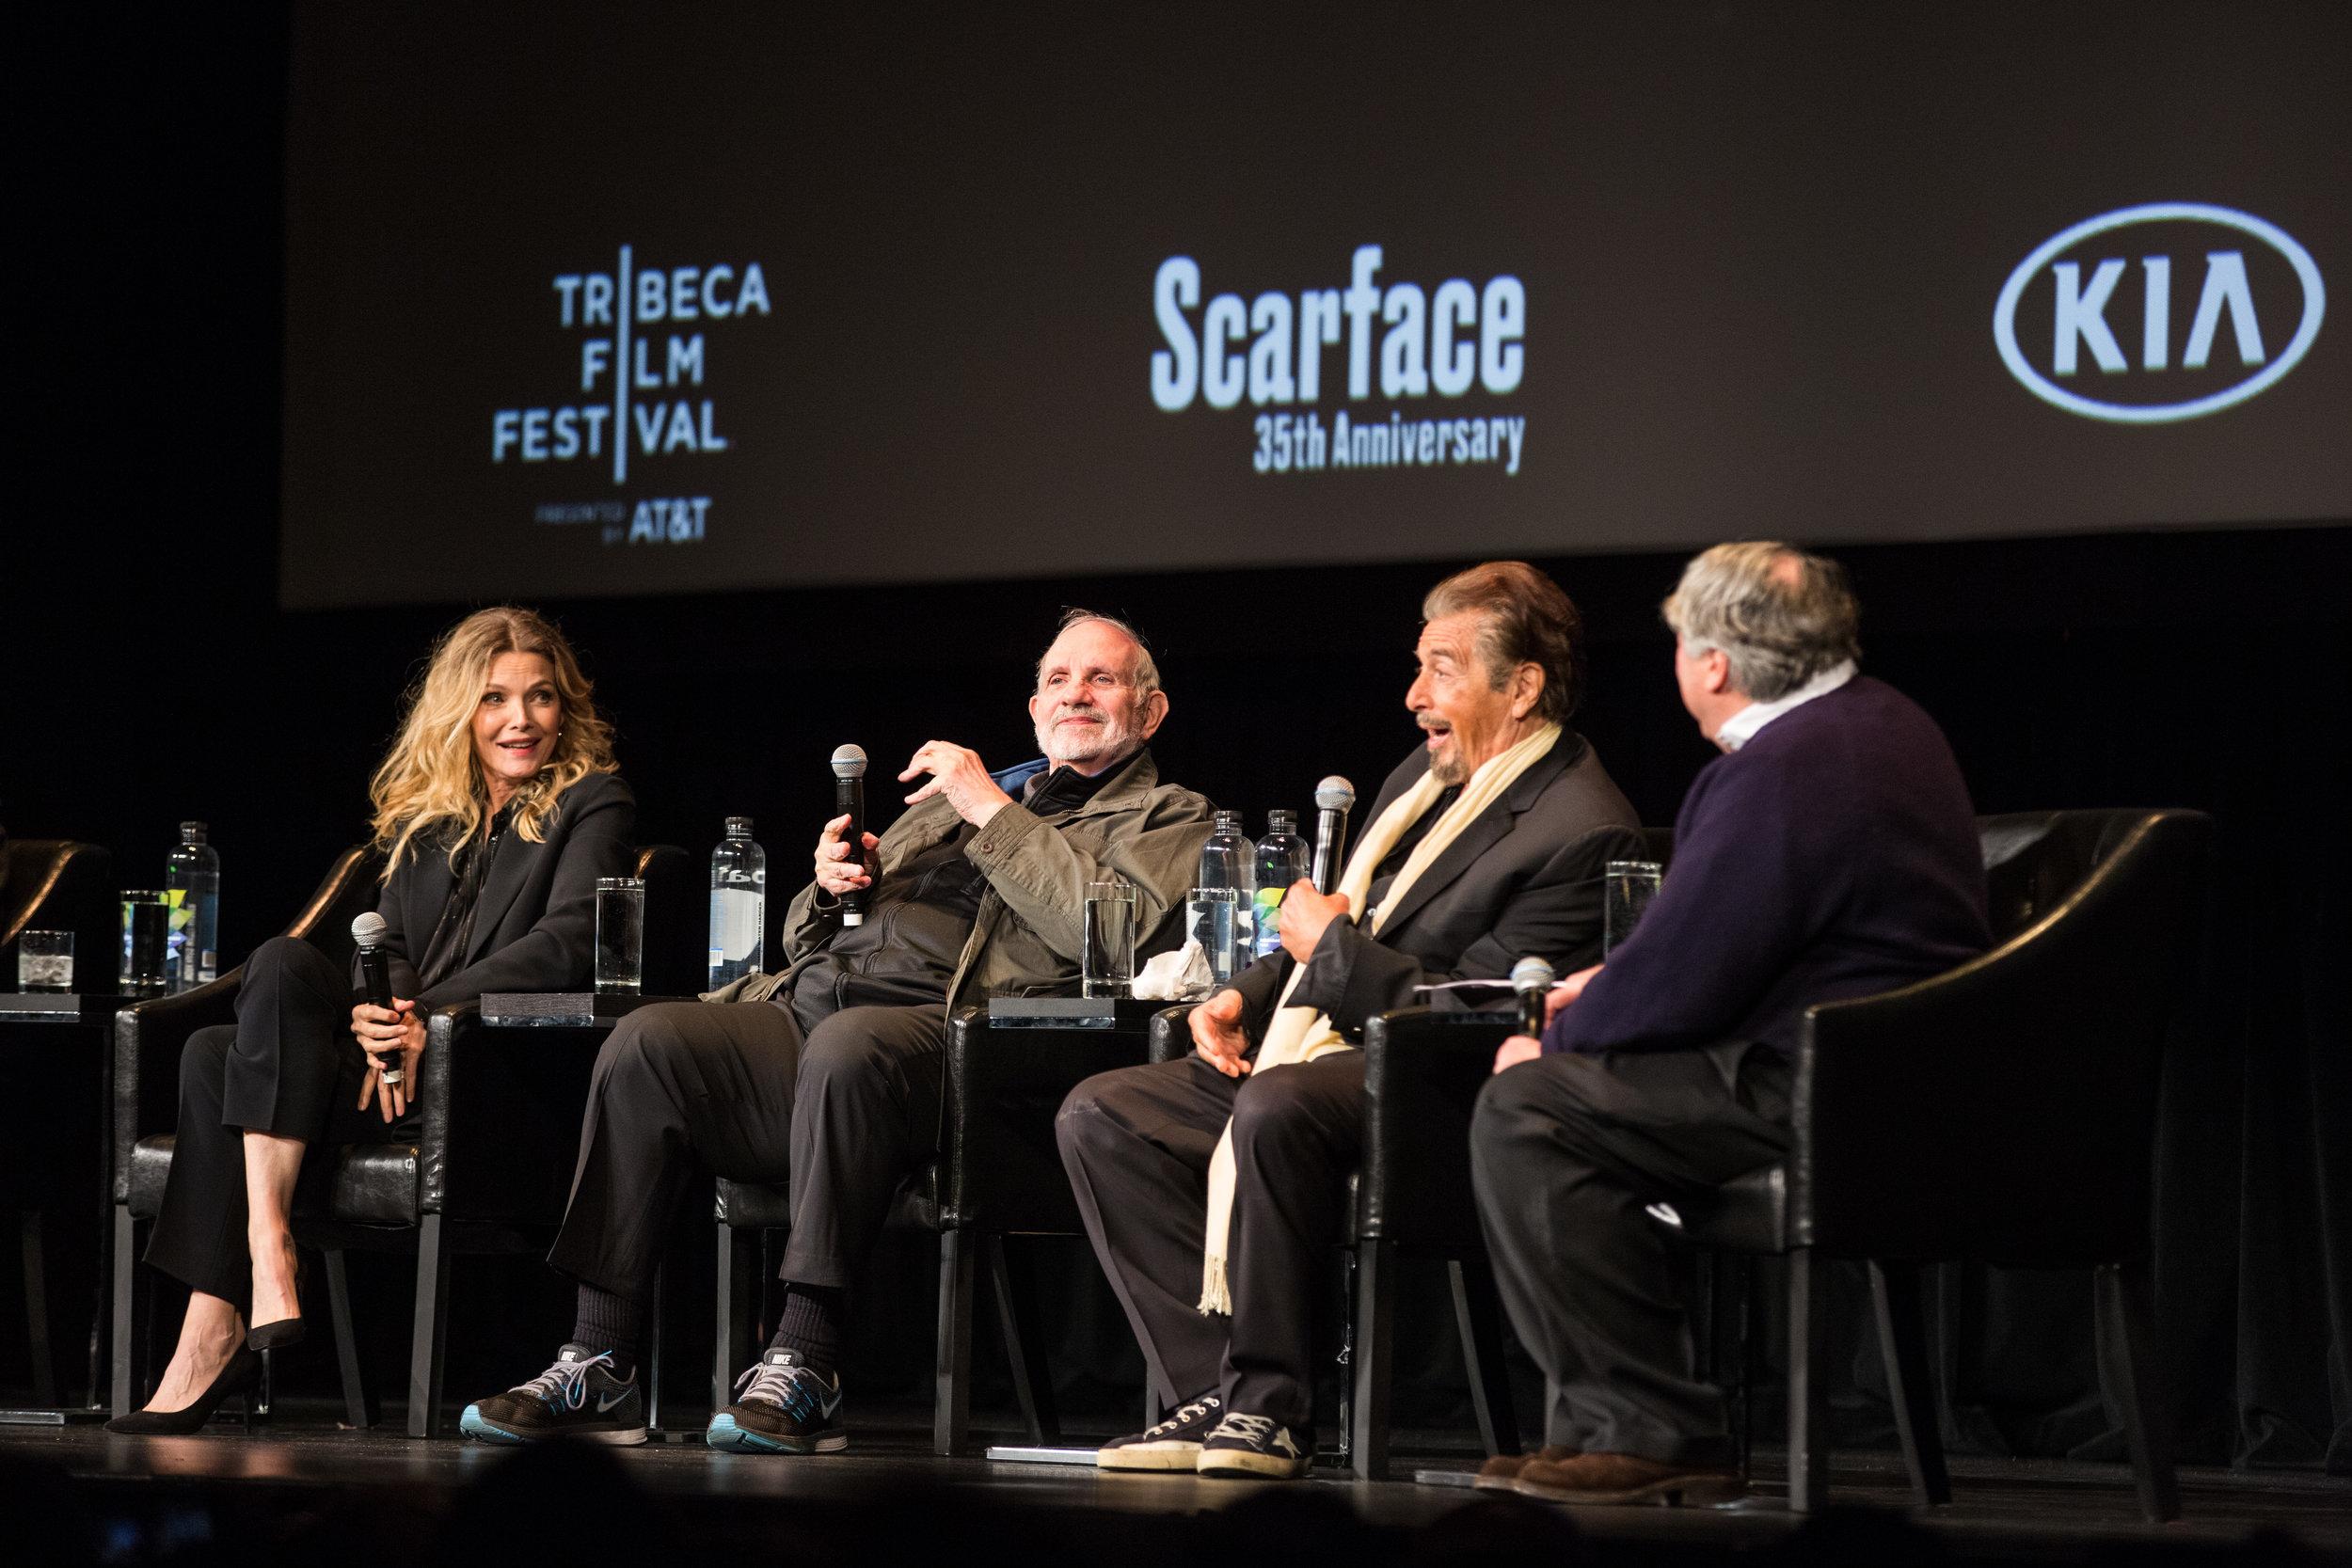 20180419-TFF-Scarface 35th-148.jpg